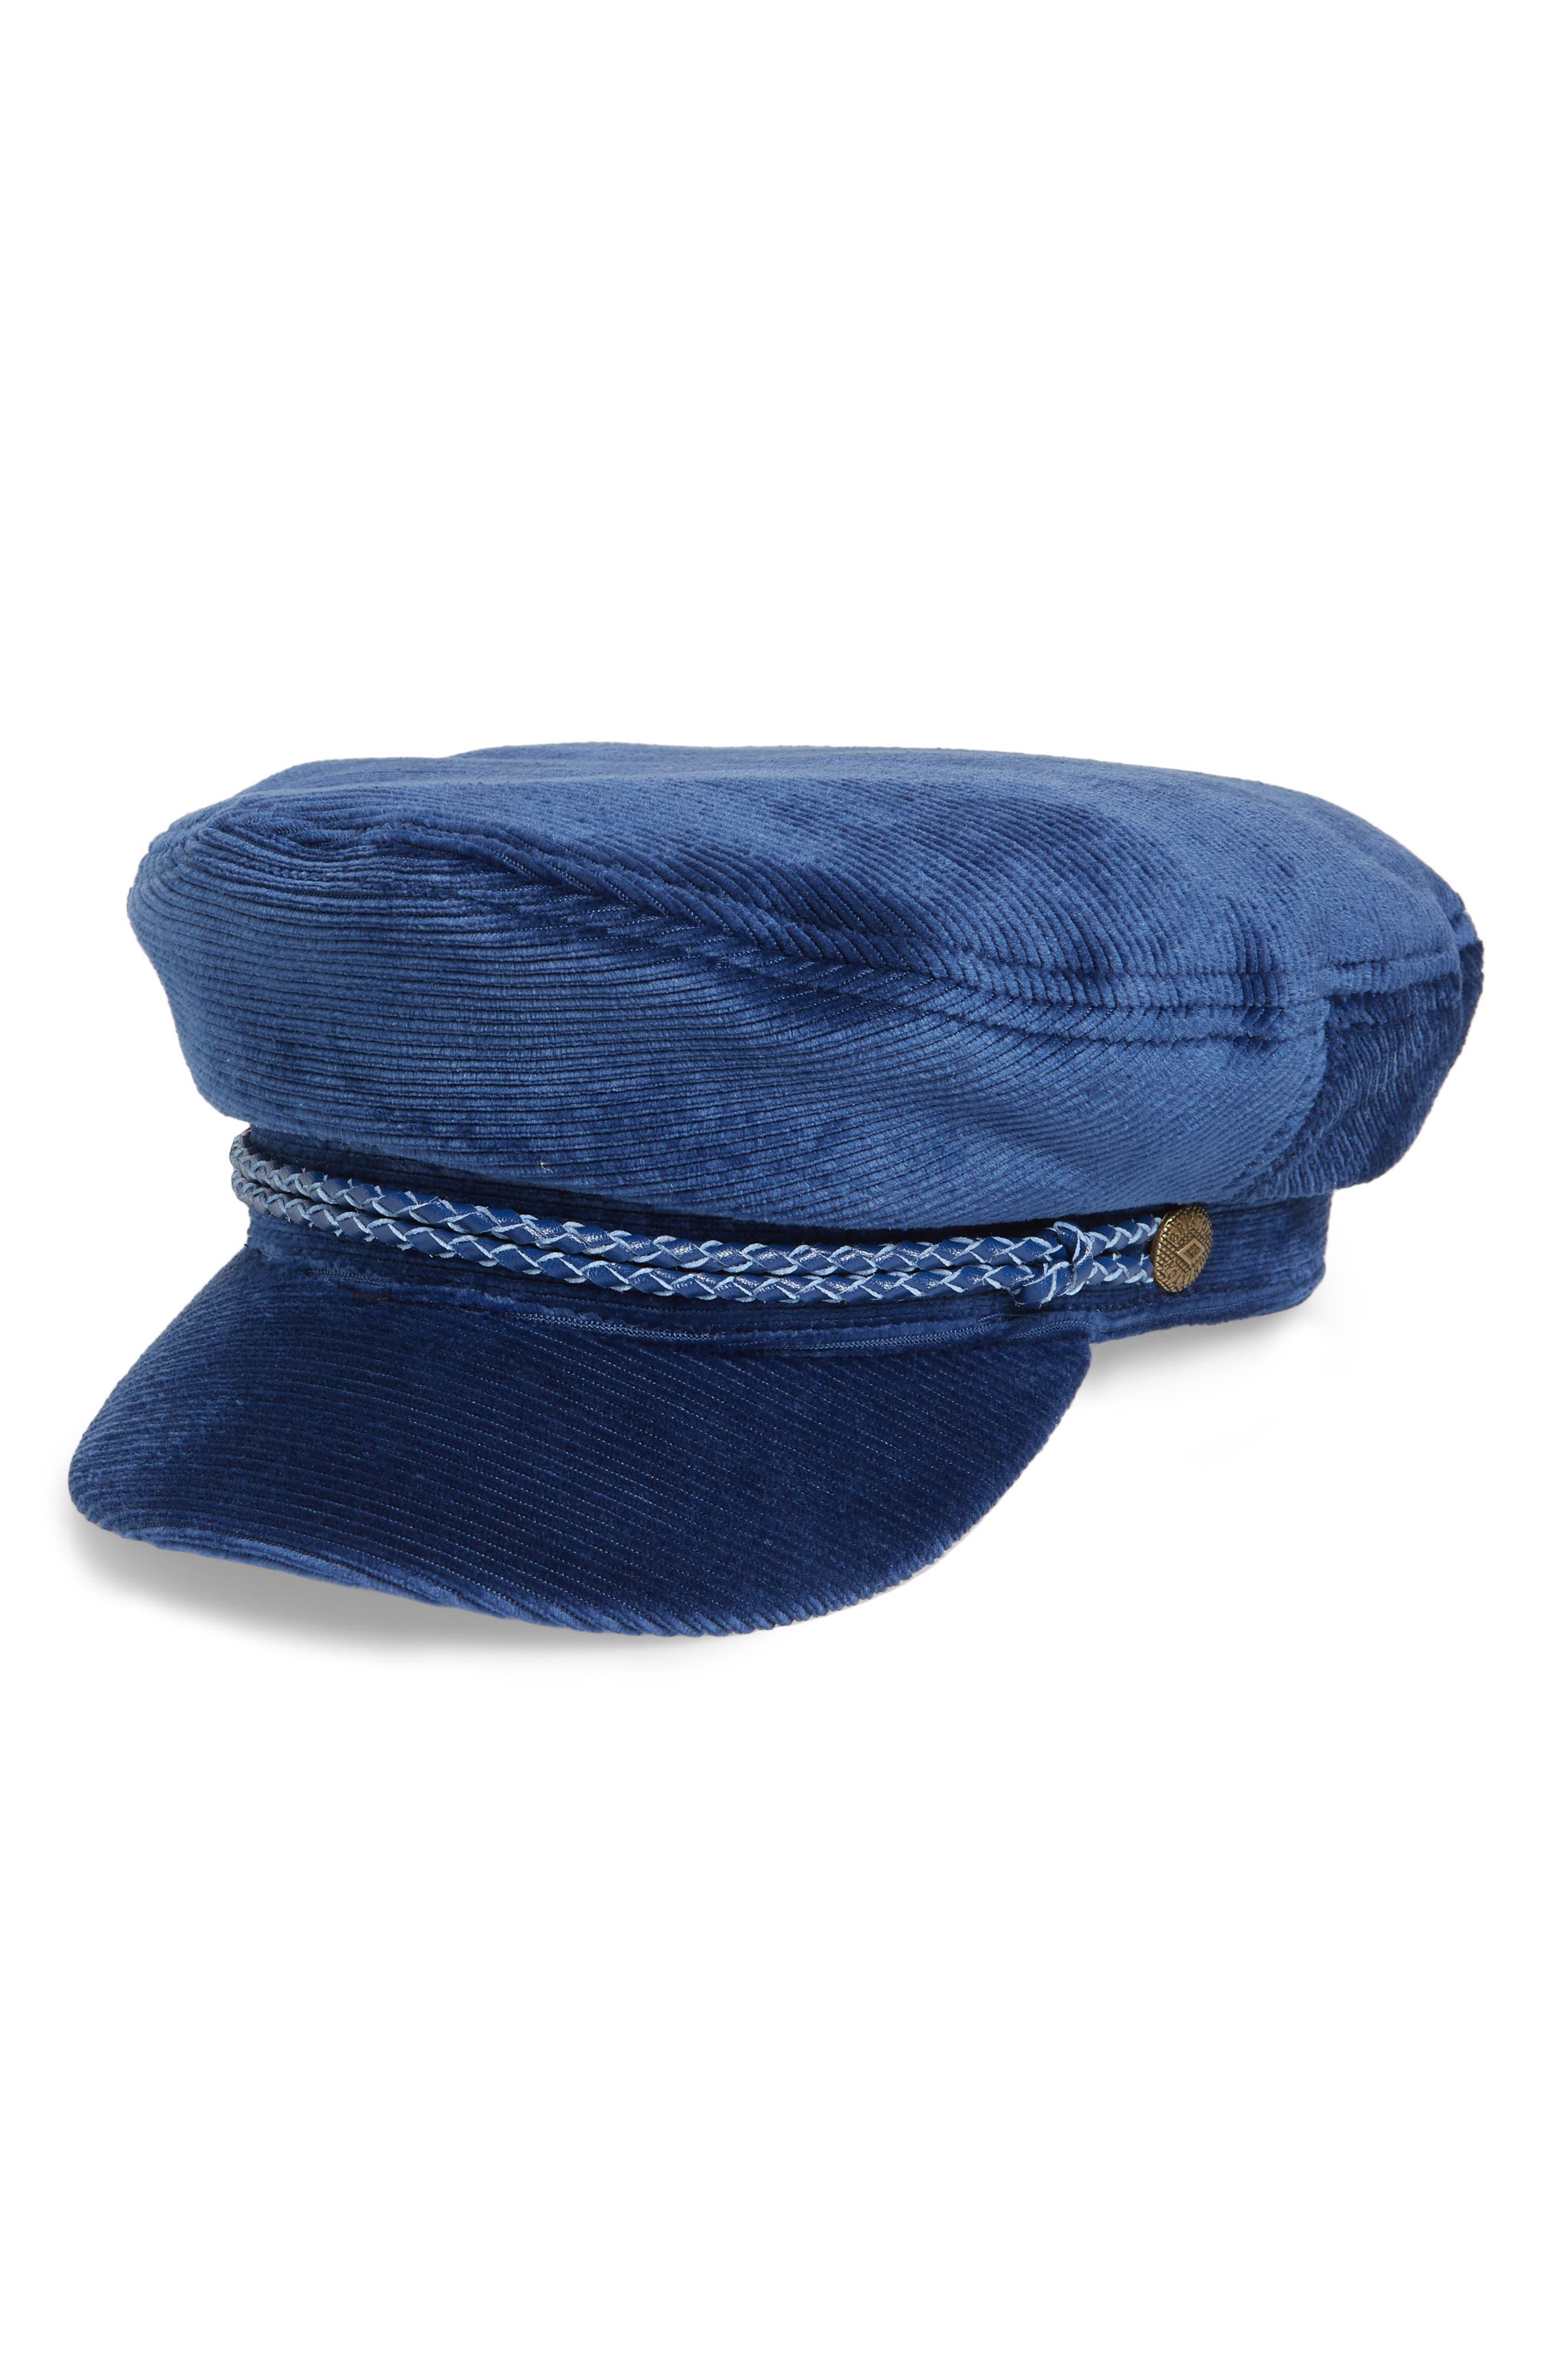 Fiddler Corduroy Baker Boy Cap,                         Main,                         color, Blue Cord